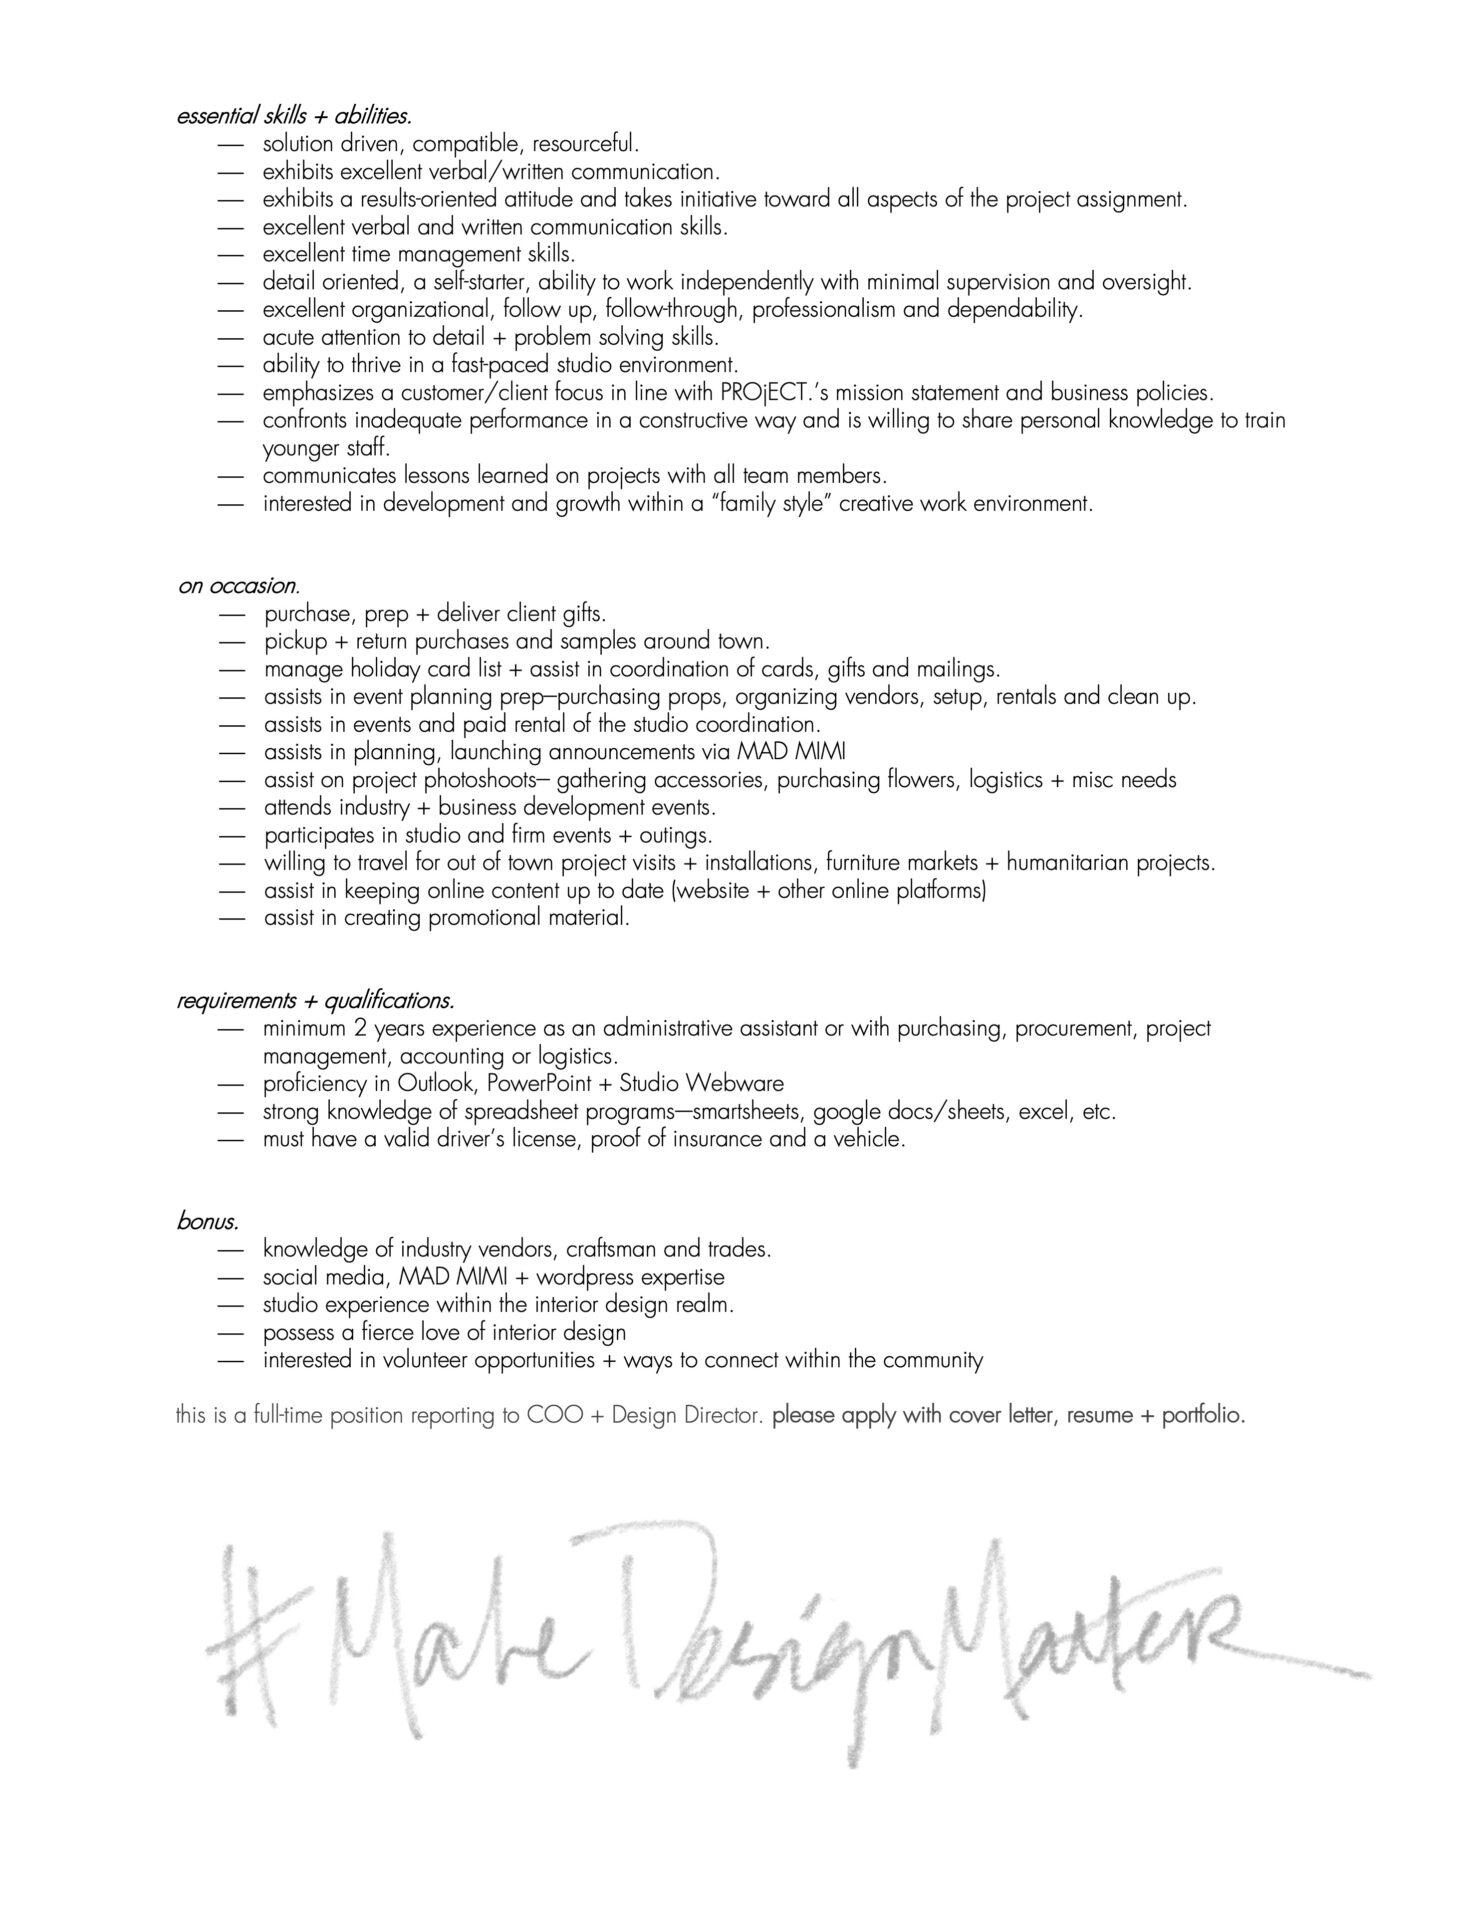 PROjECT Senior Designer Position - page 3